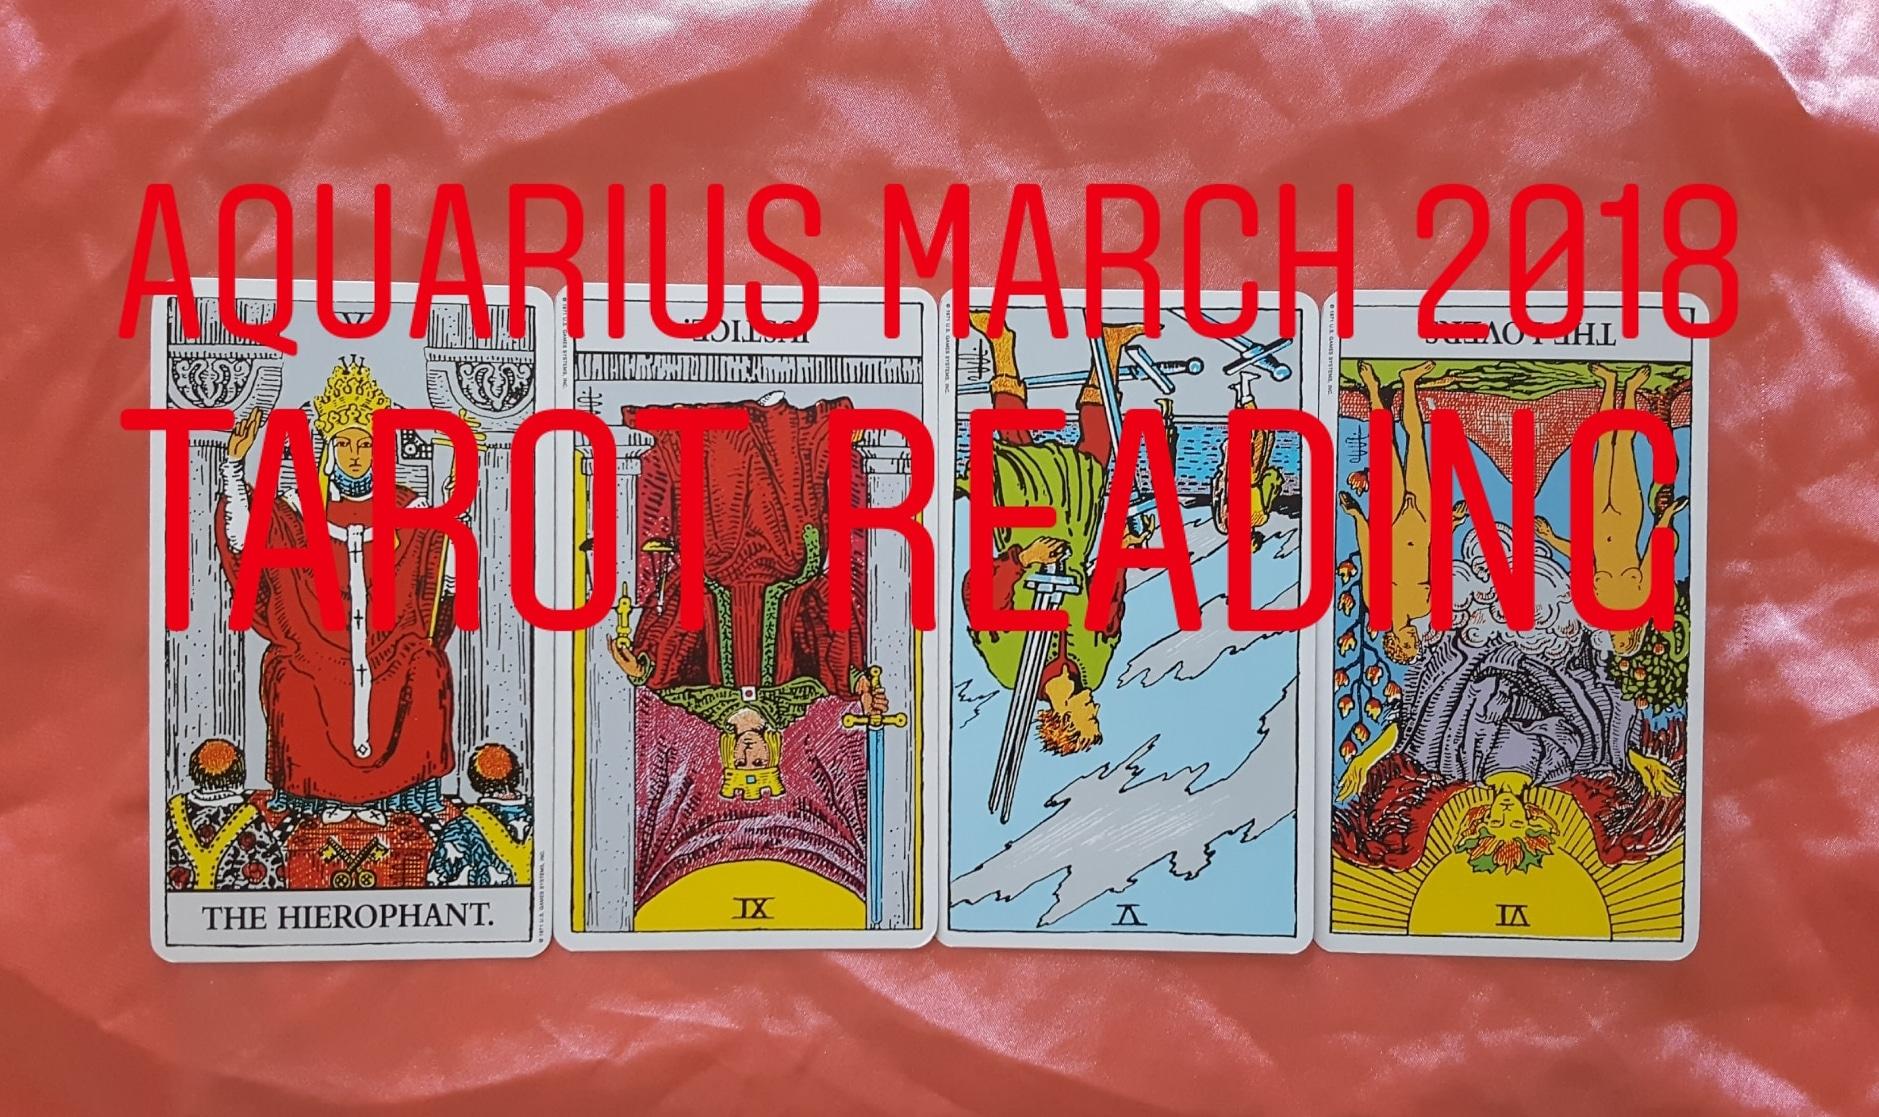 Aquarius March 2018  The Hierophant/ Justice reversed/ 5 of Swords reversed/ The Lovers reversed